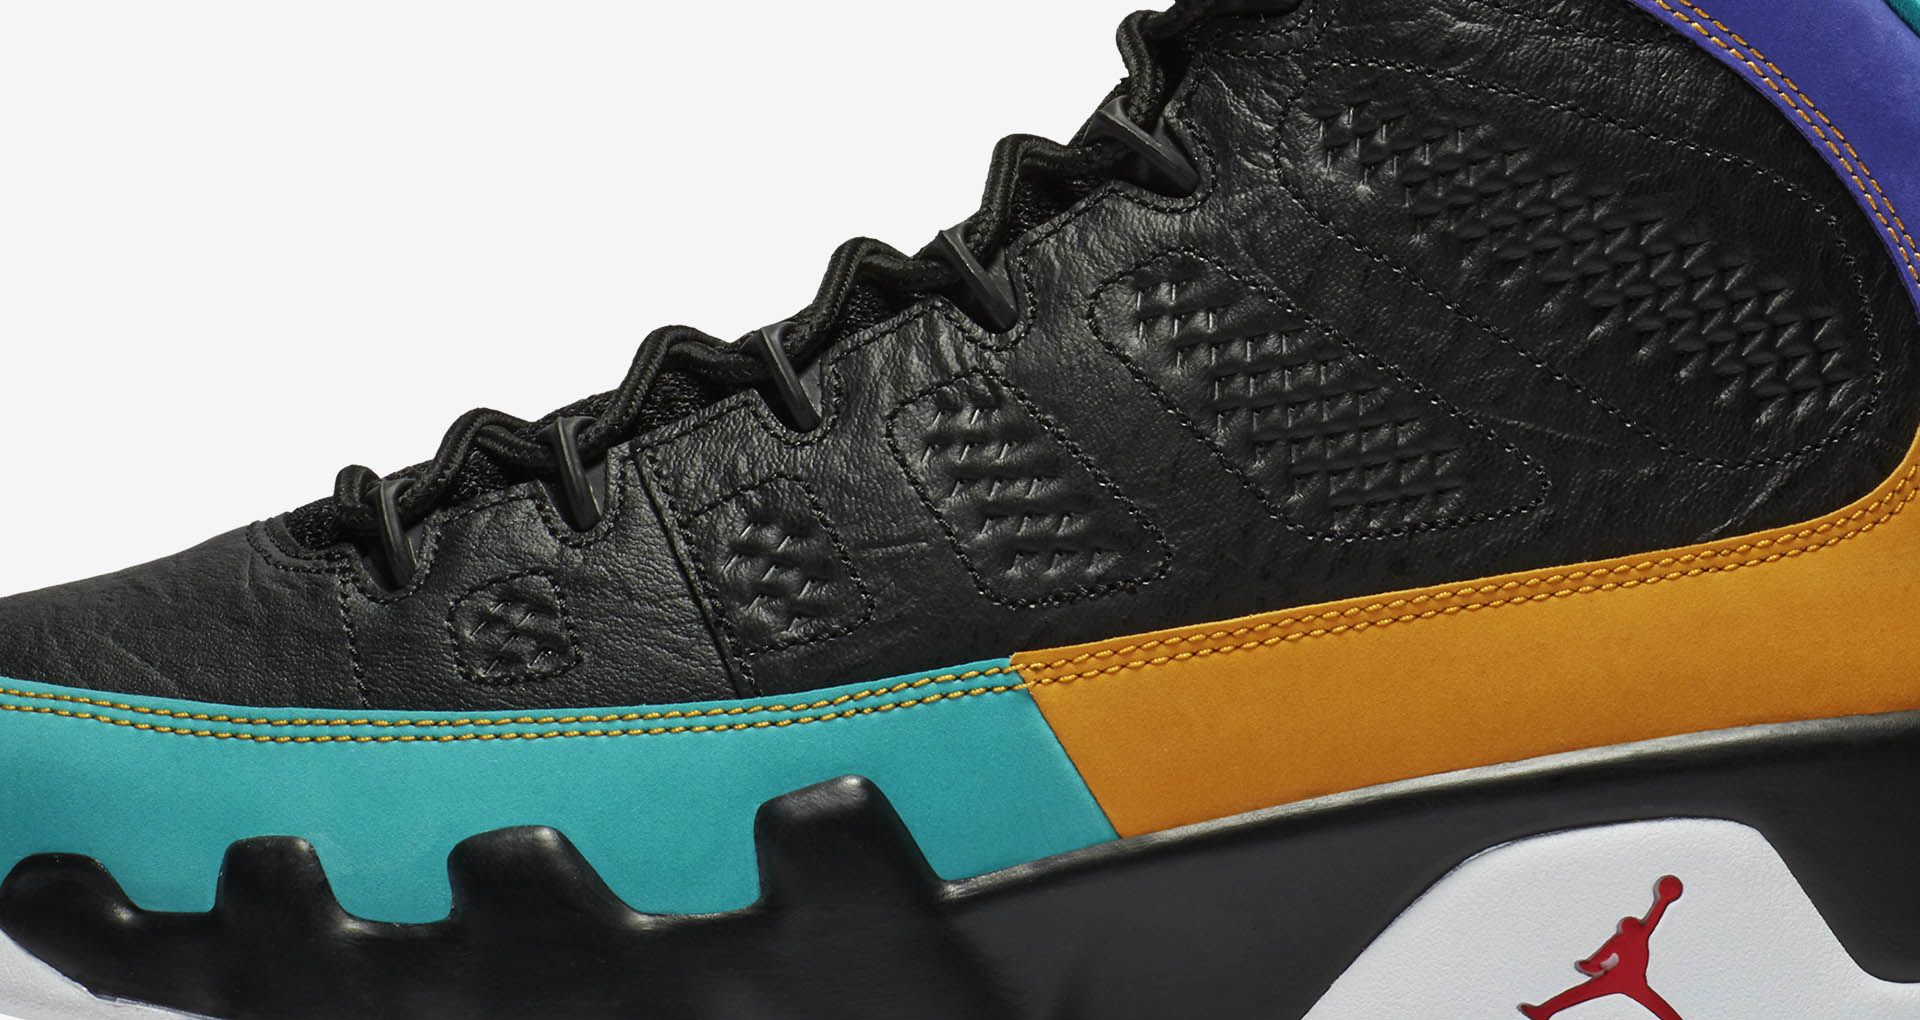 factory price 06b98 d9ffa Air Jordan 9 'Black & Dark Concord & Canyon Gold' Release ...